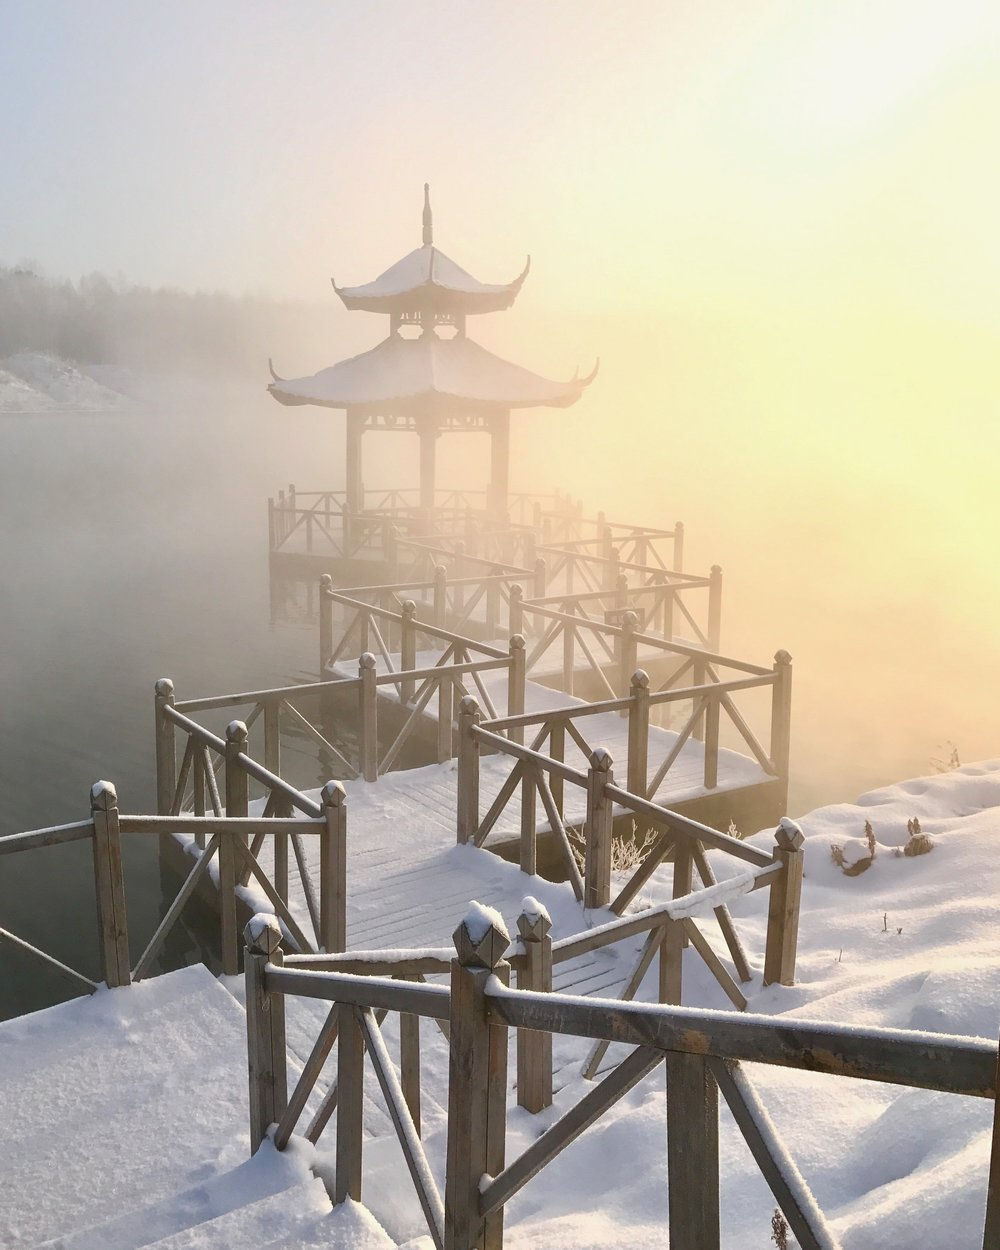 Jilin-Fusong-NikiCsanyi